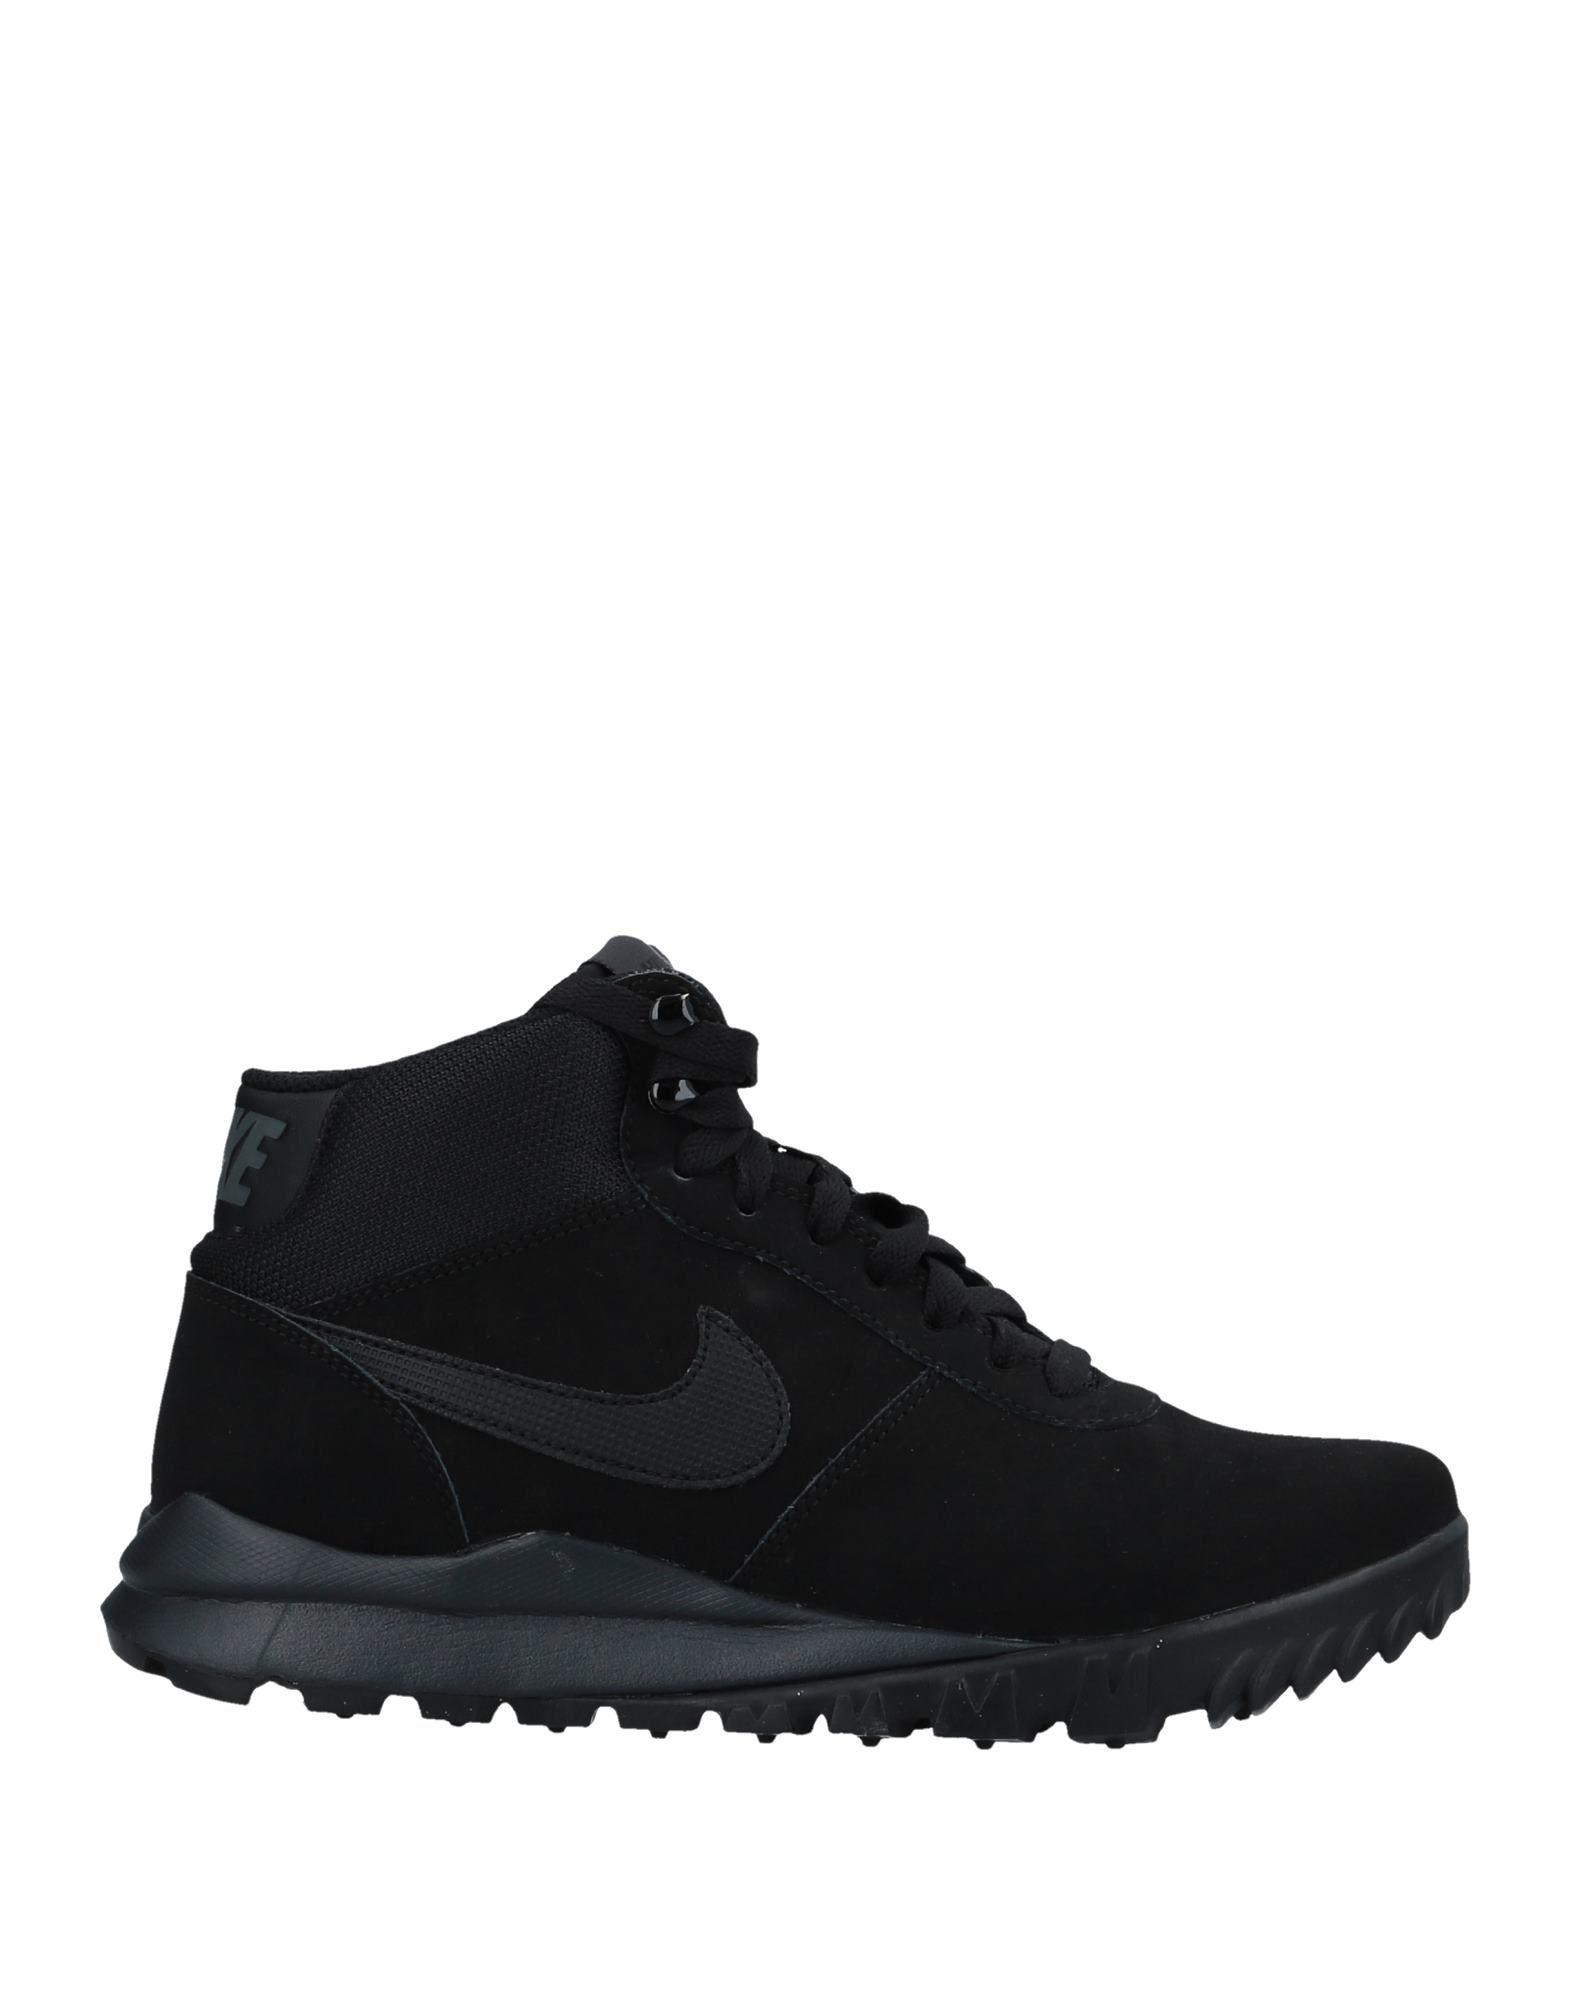 Herren Nike Sneakers Herren   11508201WR Heiße Schuhe 6cf5b6